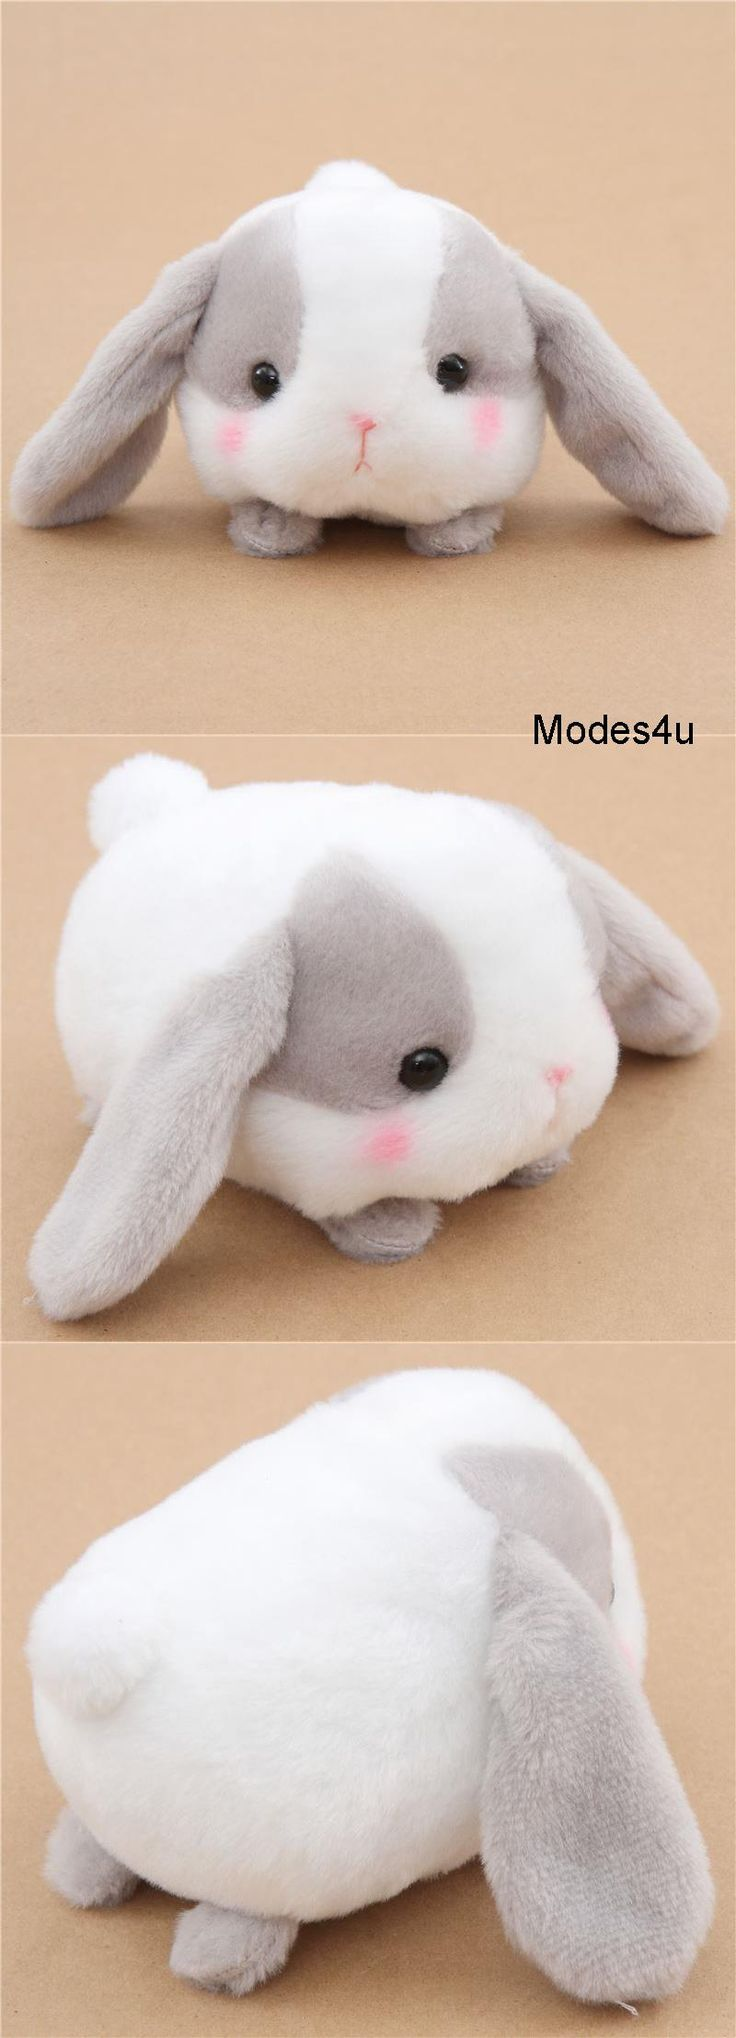 kawaii white and grey bunny rabbit Poteusa Loppy plush toy from Japan